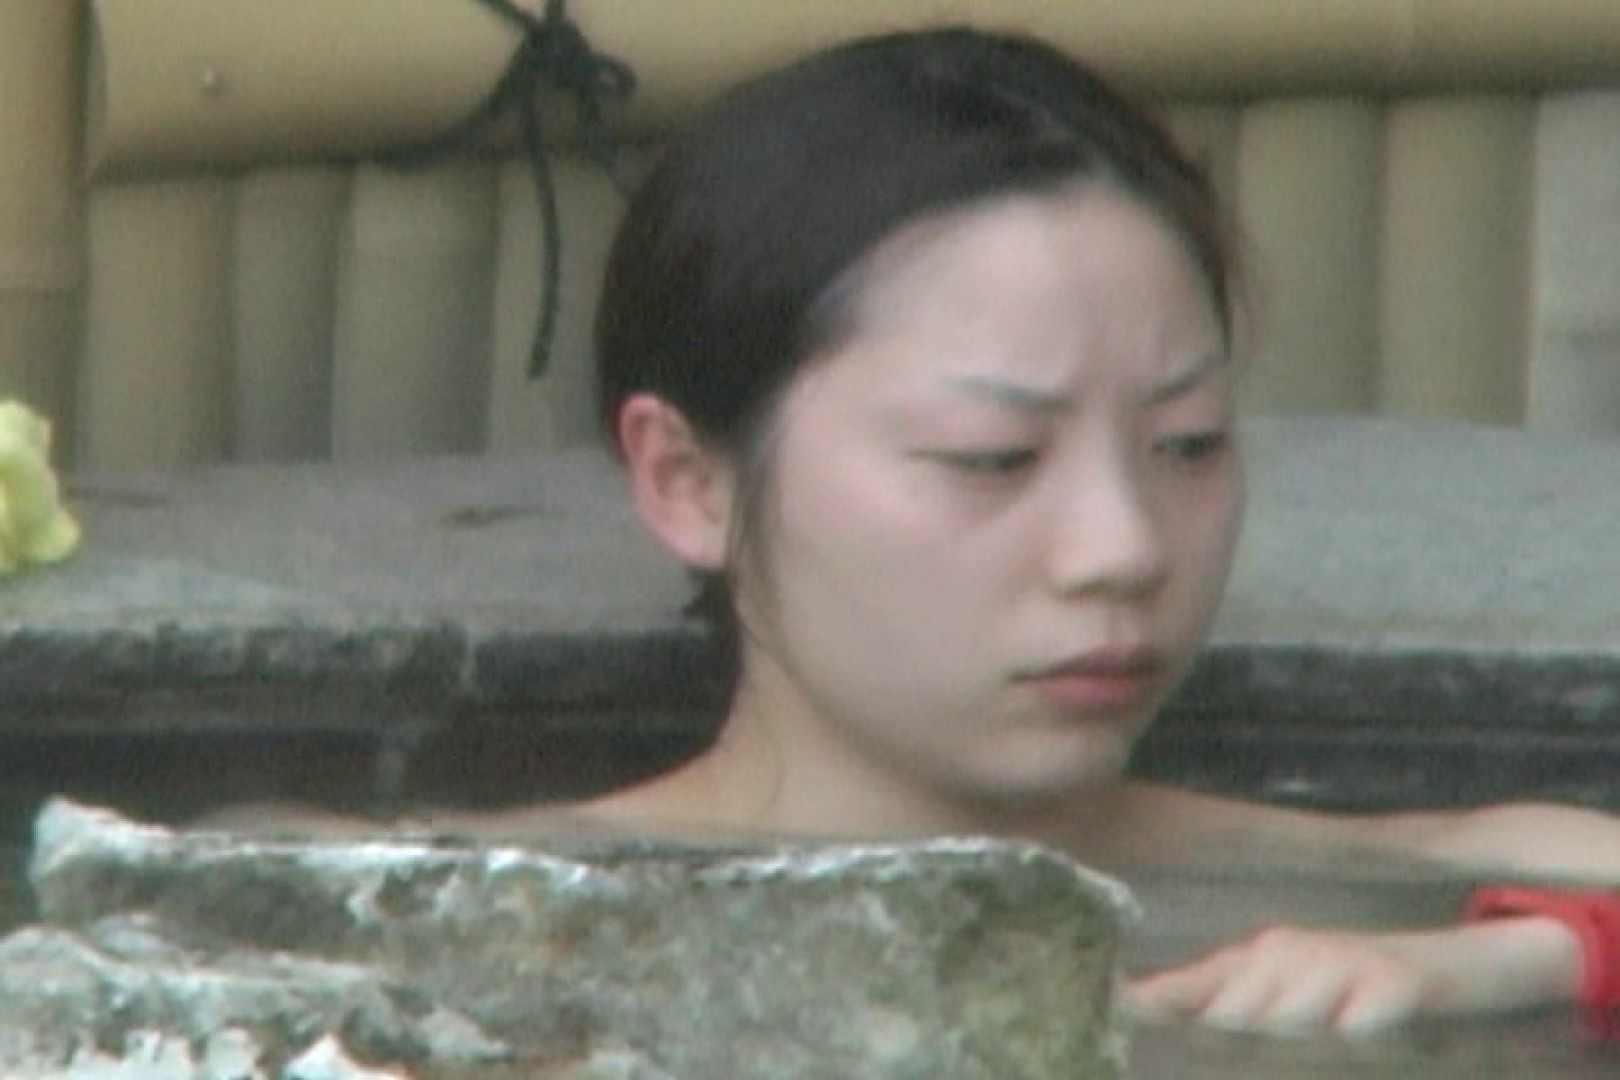 Aquaな露天風呂Vol.596 露天 覗きおまんこ画像 77画像 14